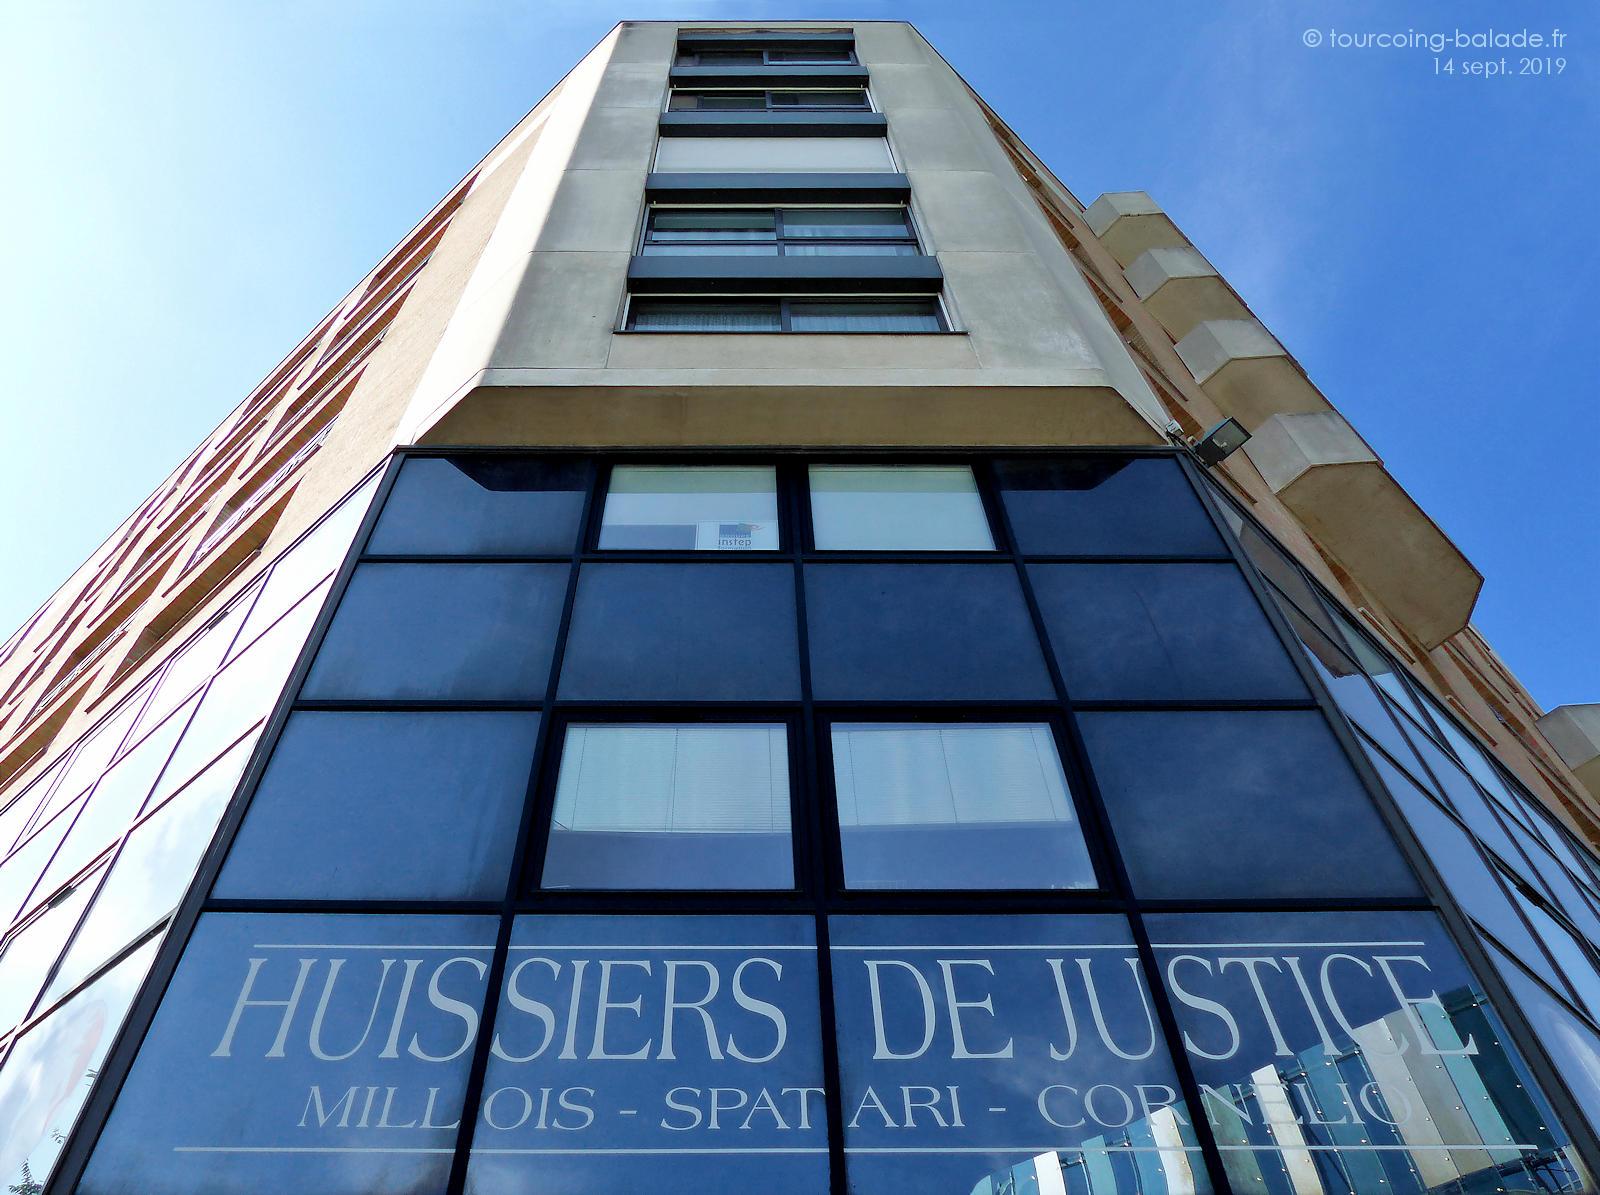 Huissiers Tourcoing Centre - Millois, Spatari, Cornelio